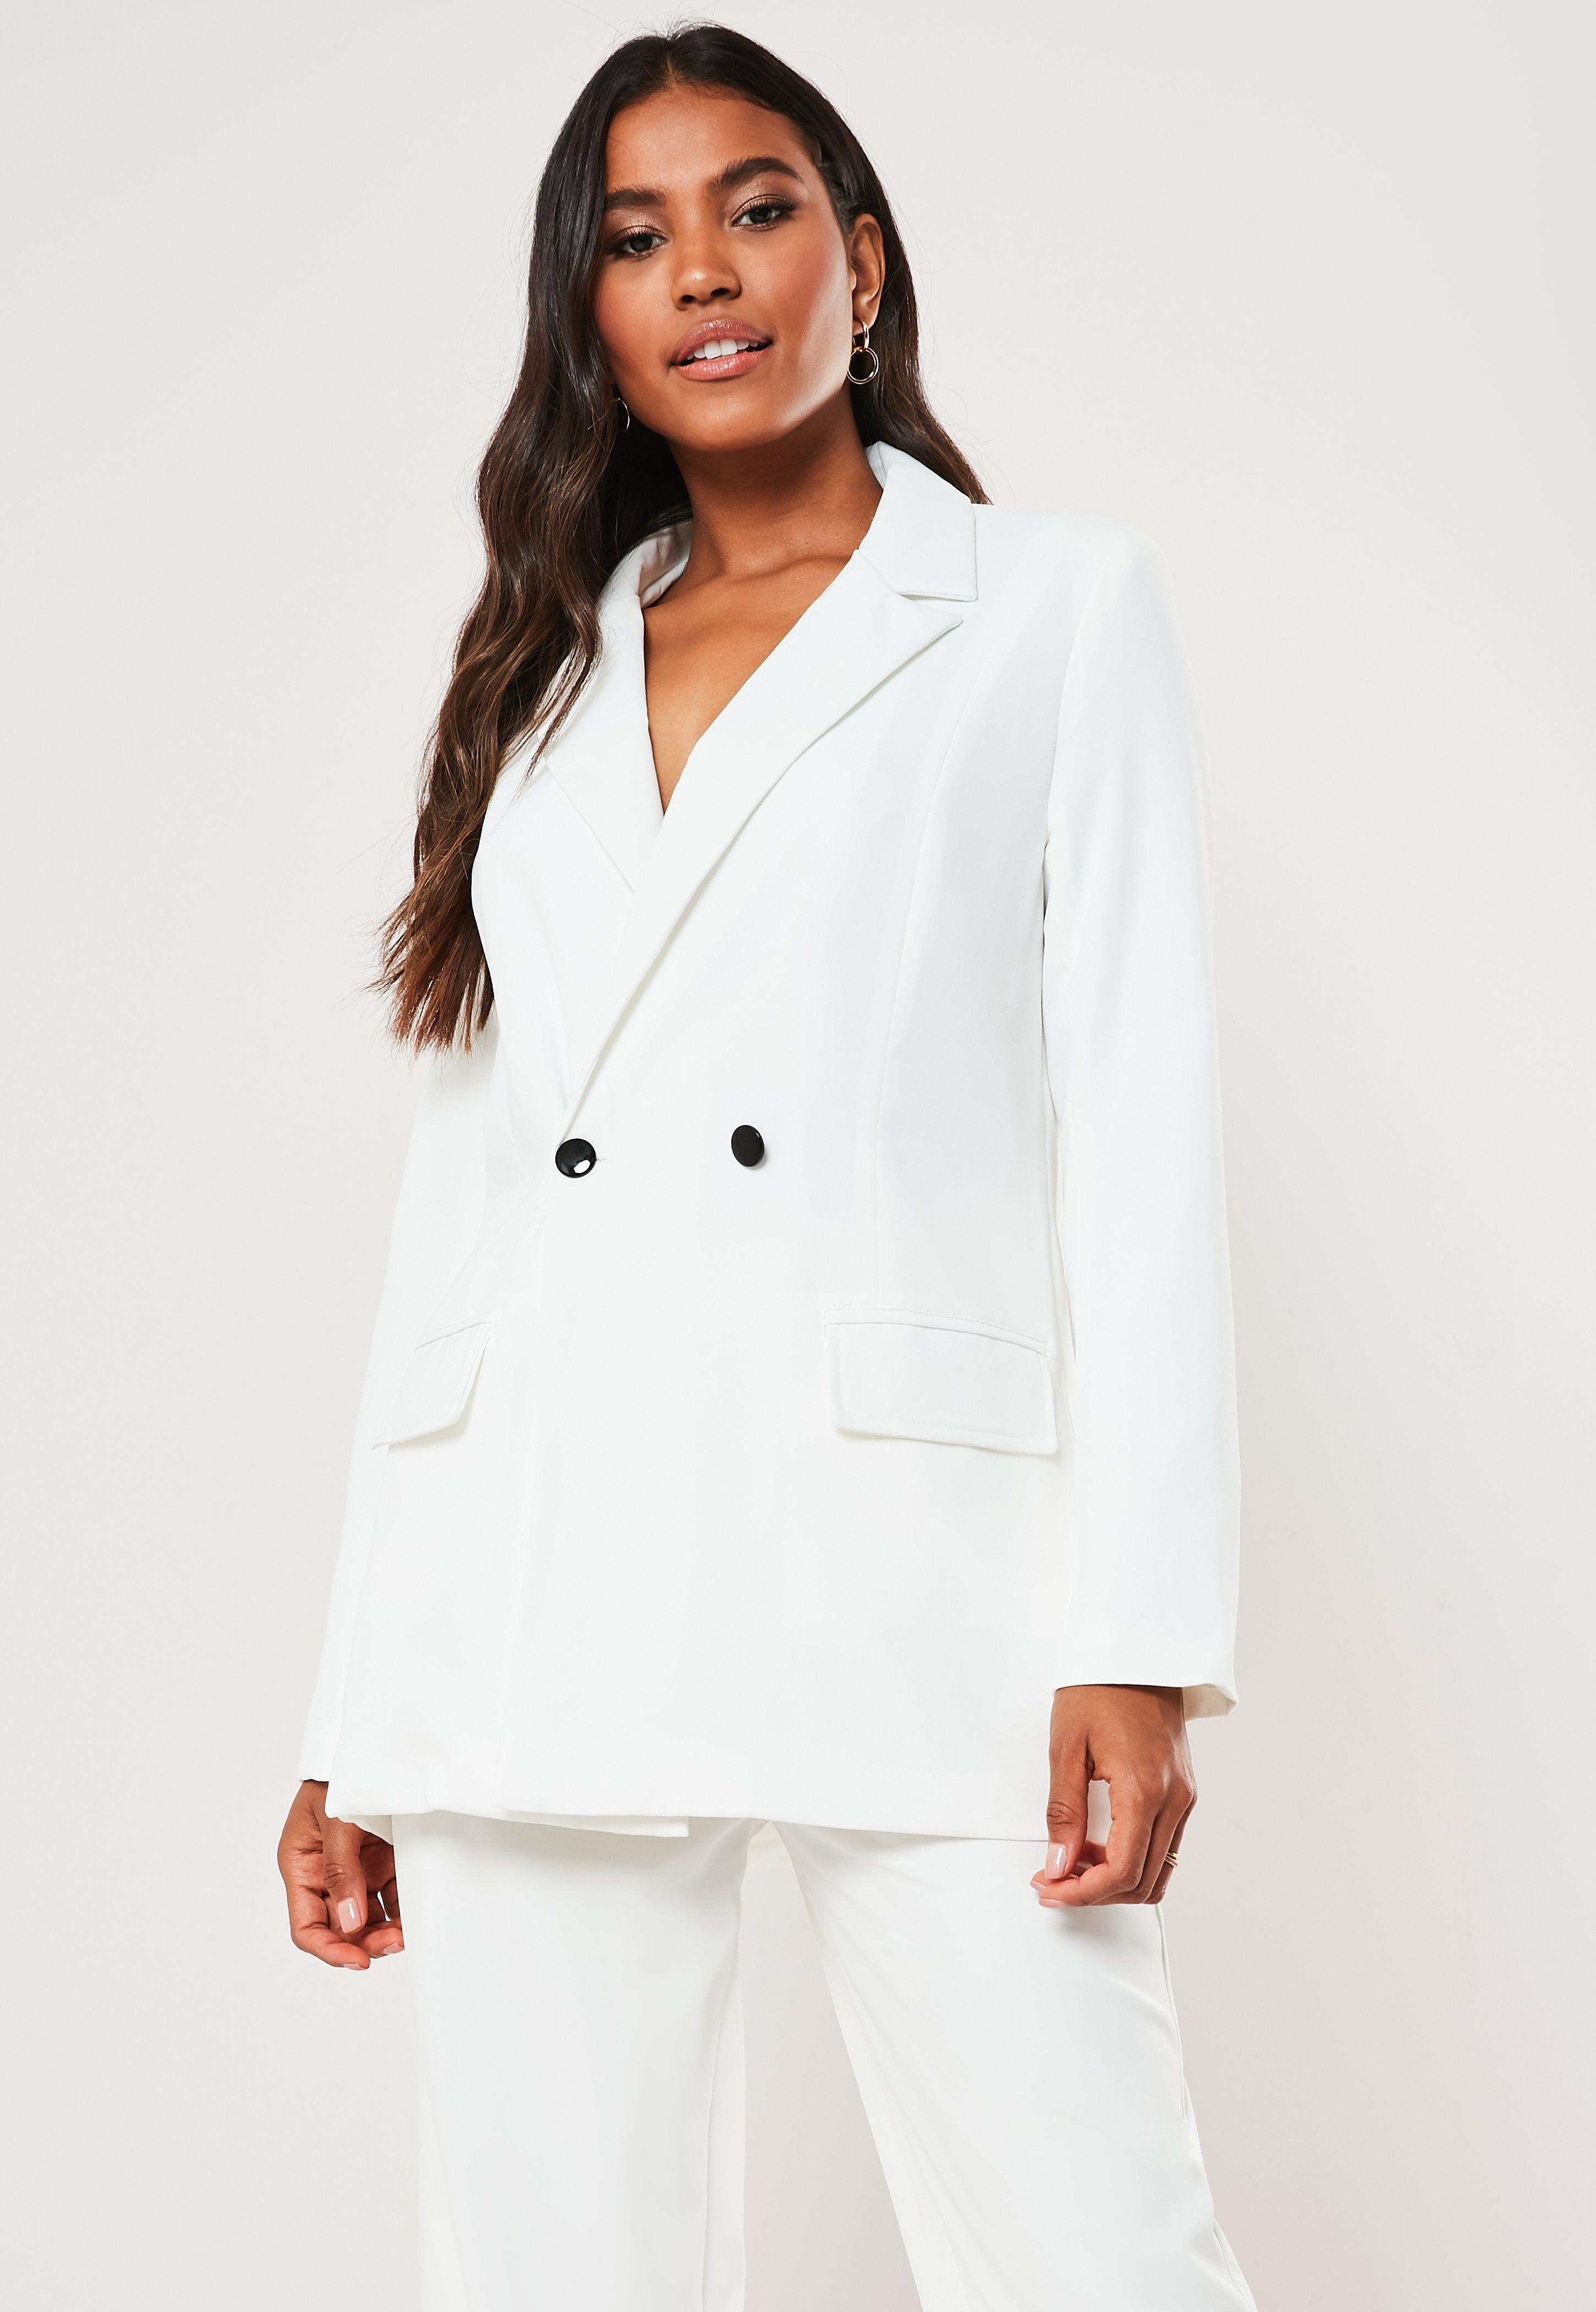 ee8bd256ebb1 Women's Coats & Jackets Online   Missguided